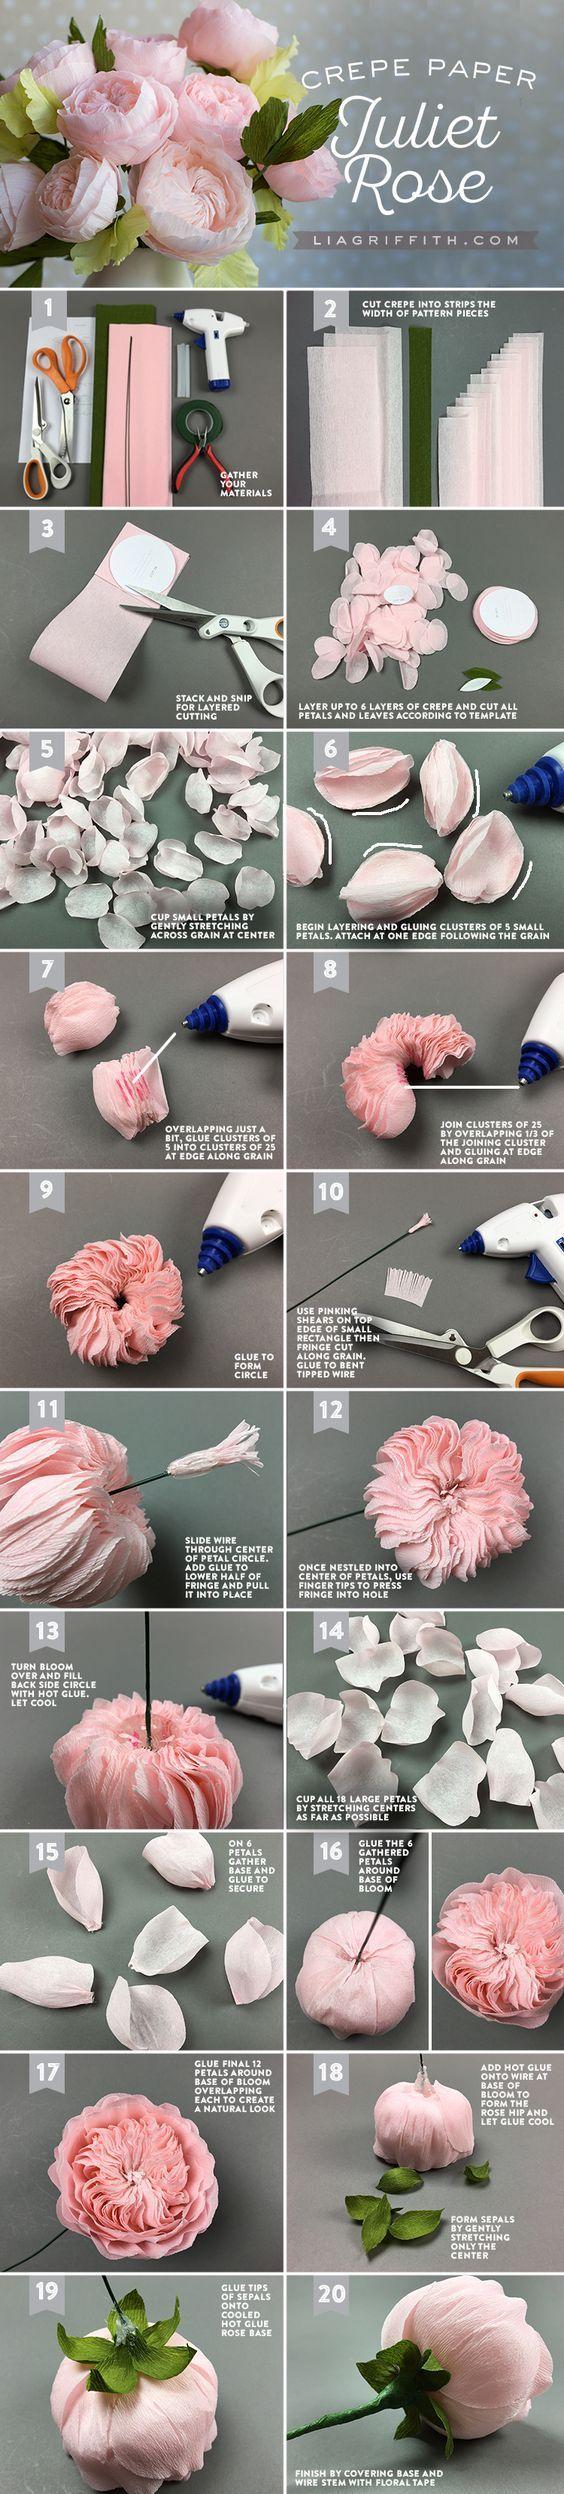 Crepe Paper Juliet Roses: